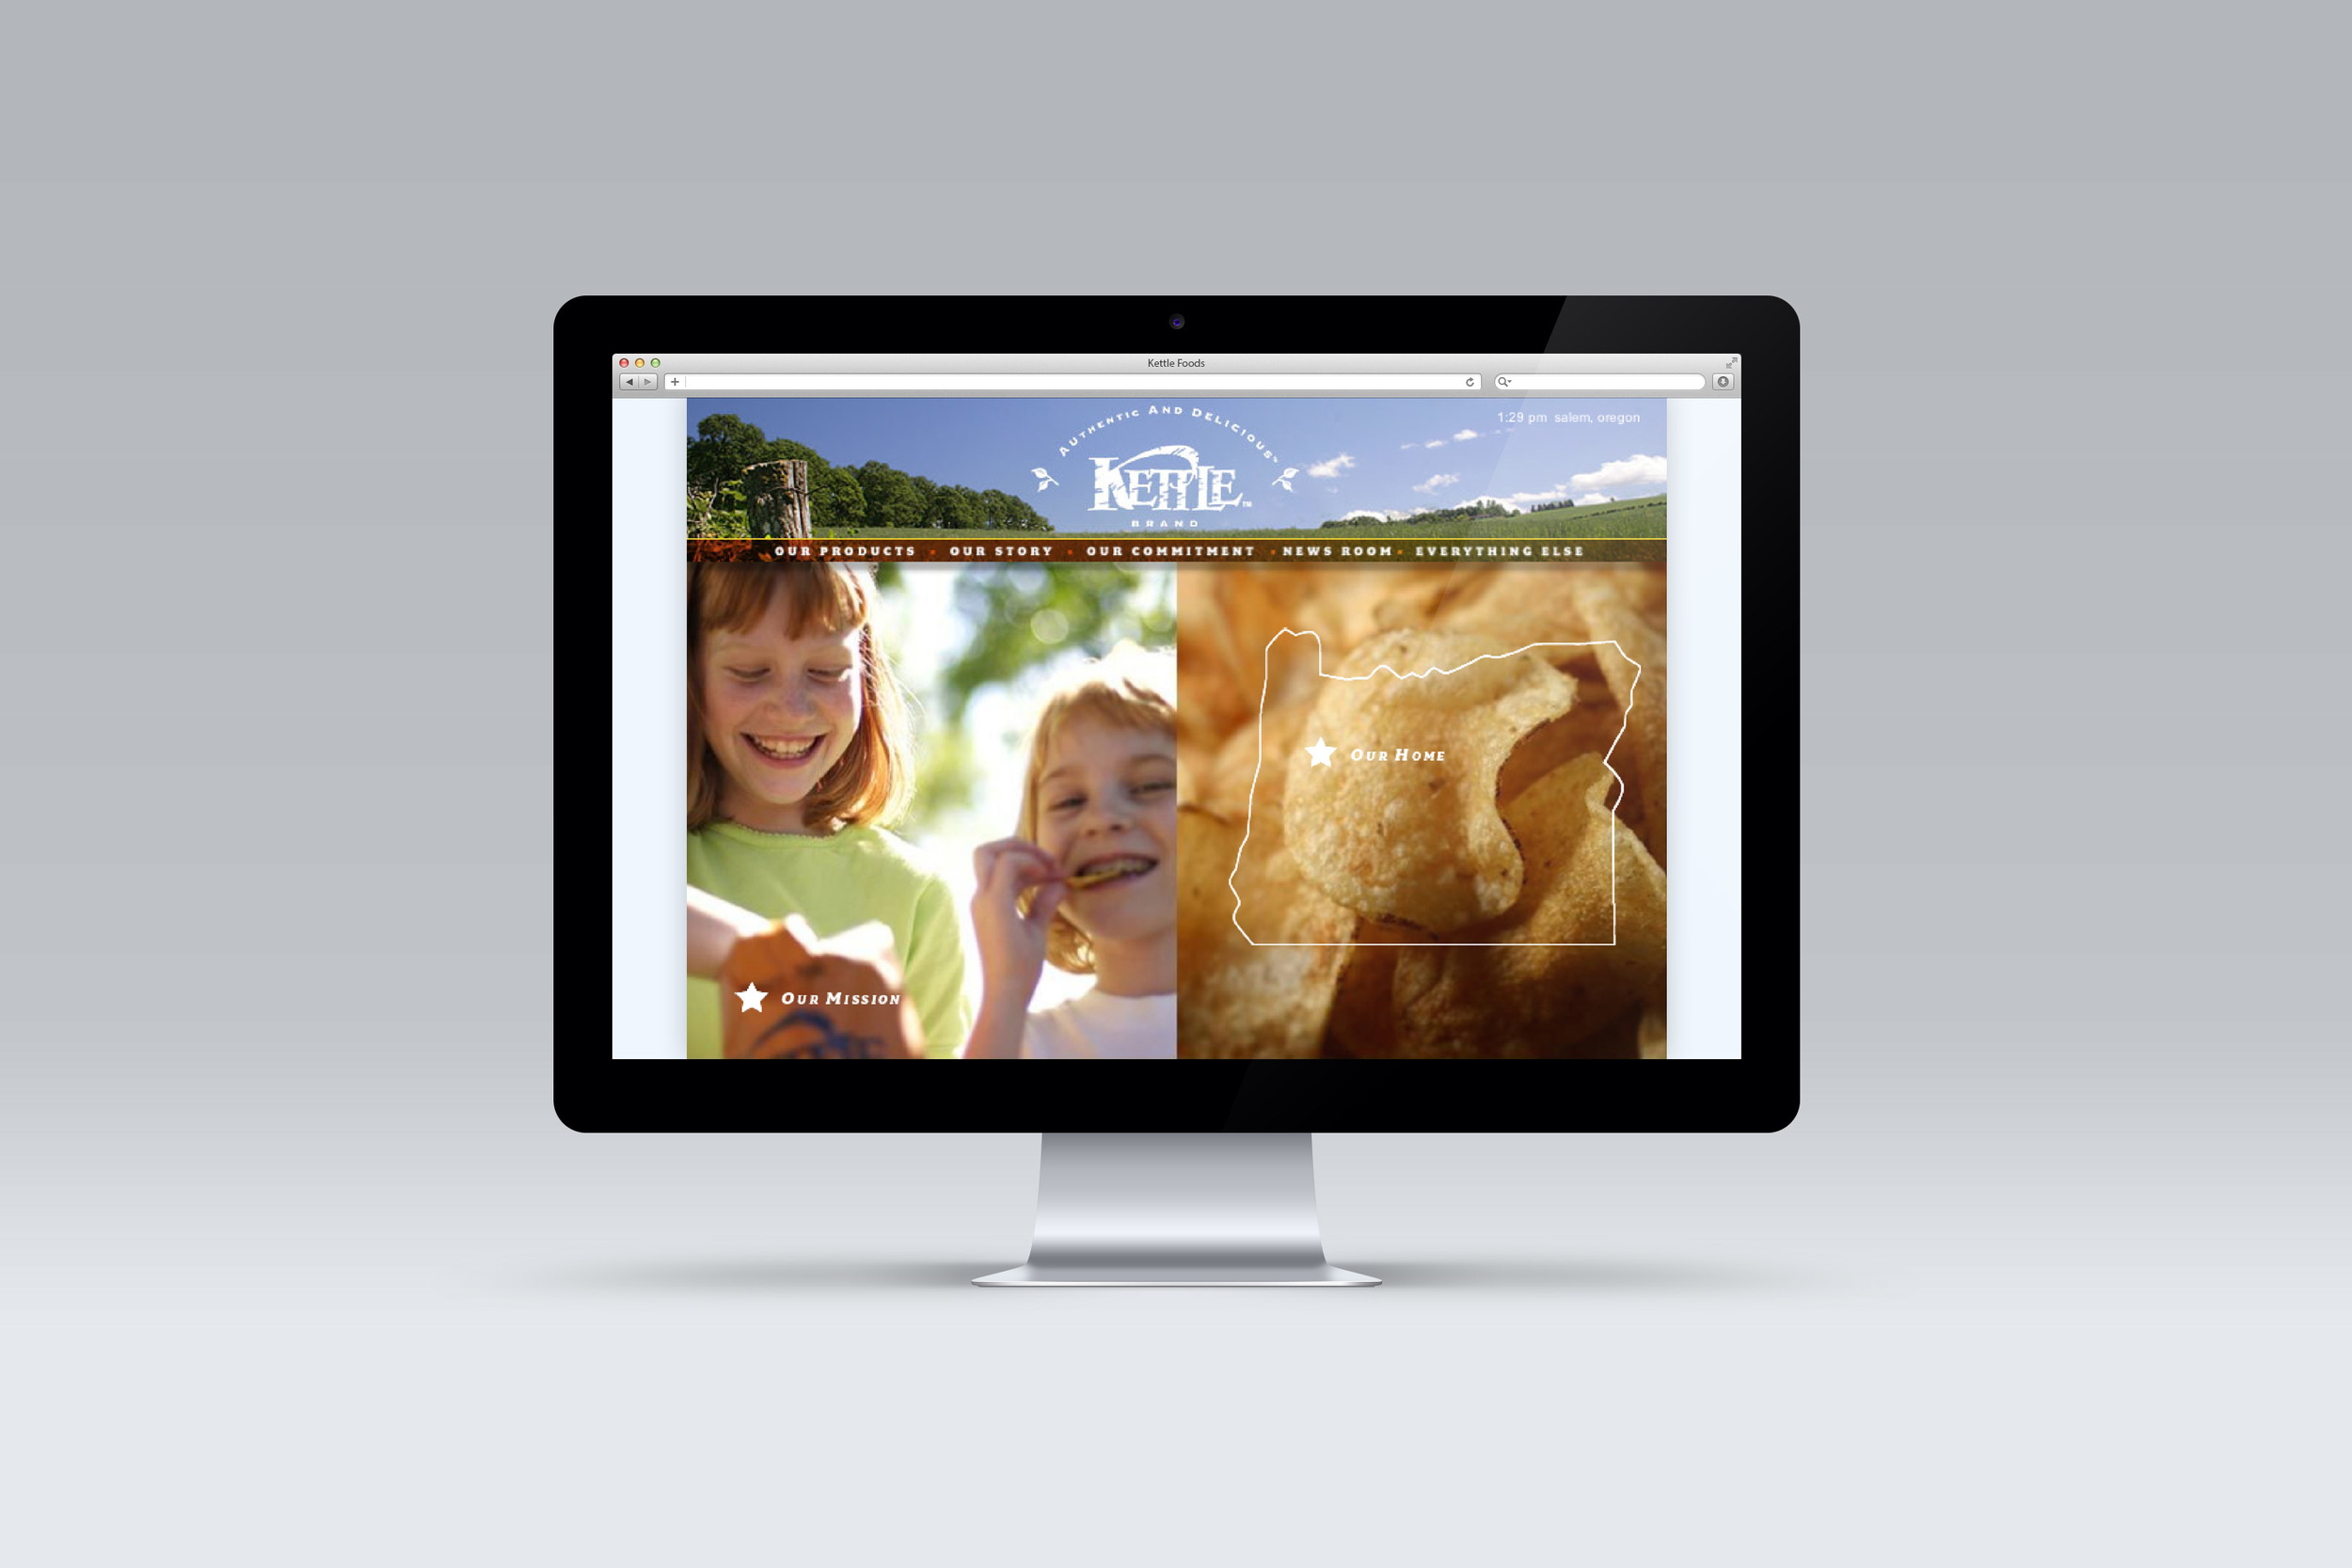 Ripple_KettleFoods_MacScreen_Mockup.jpg